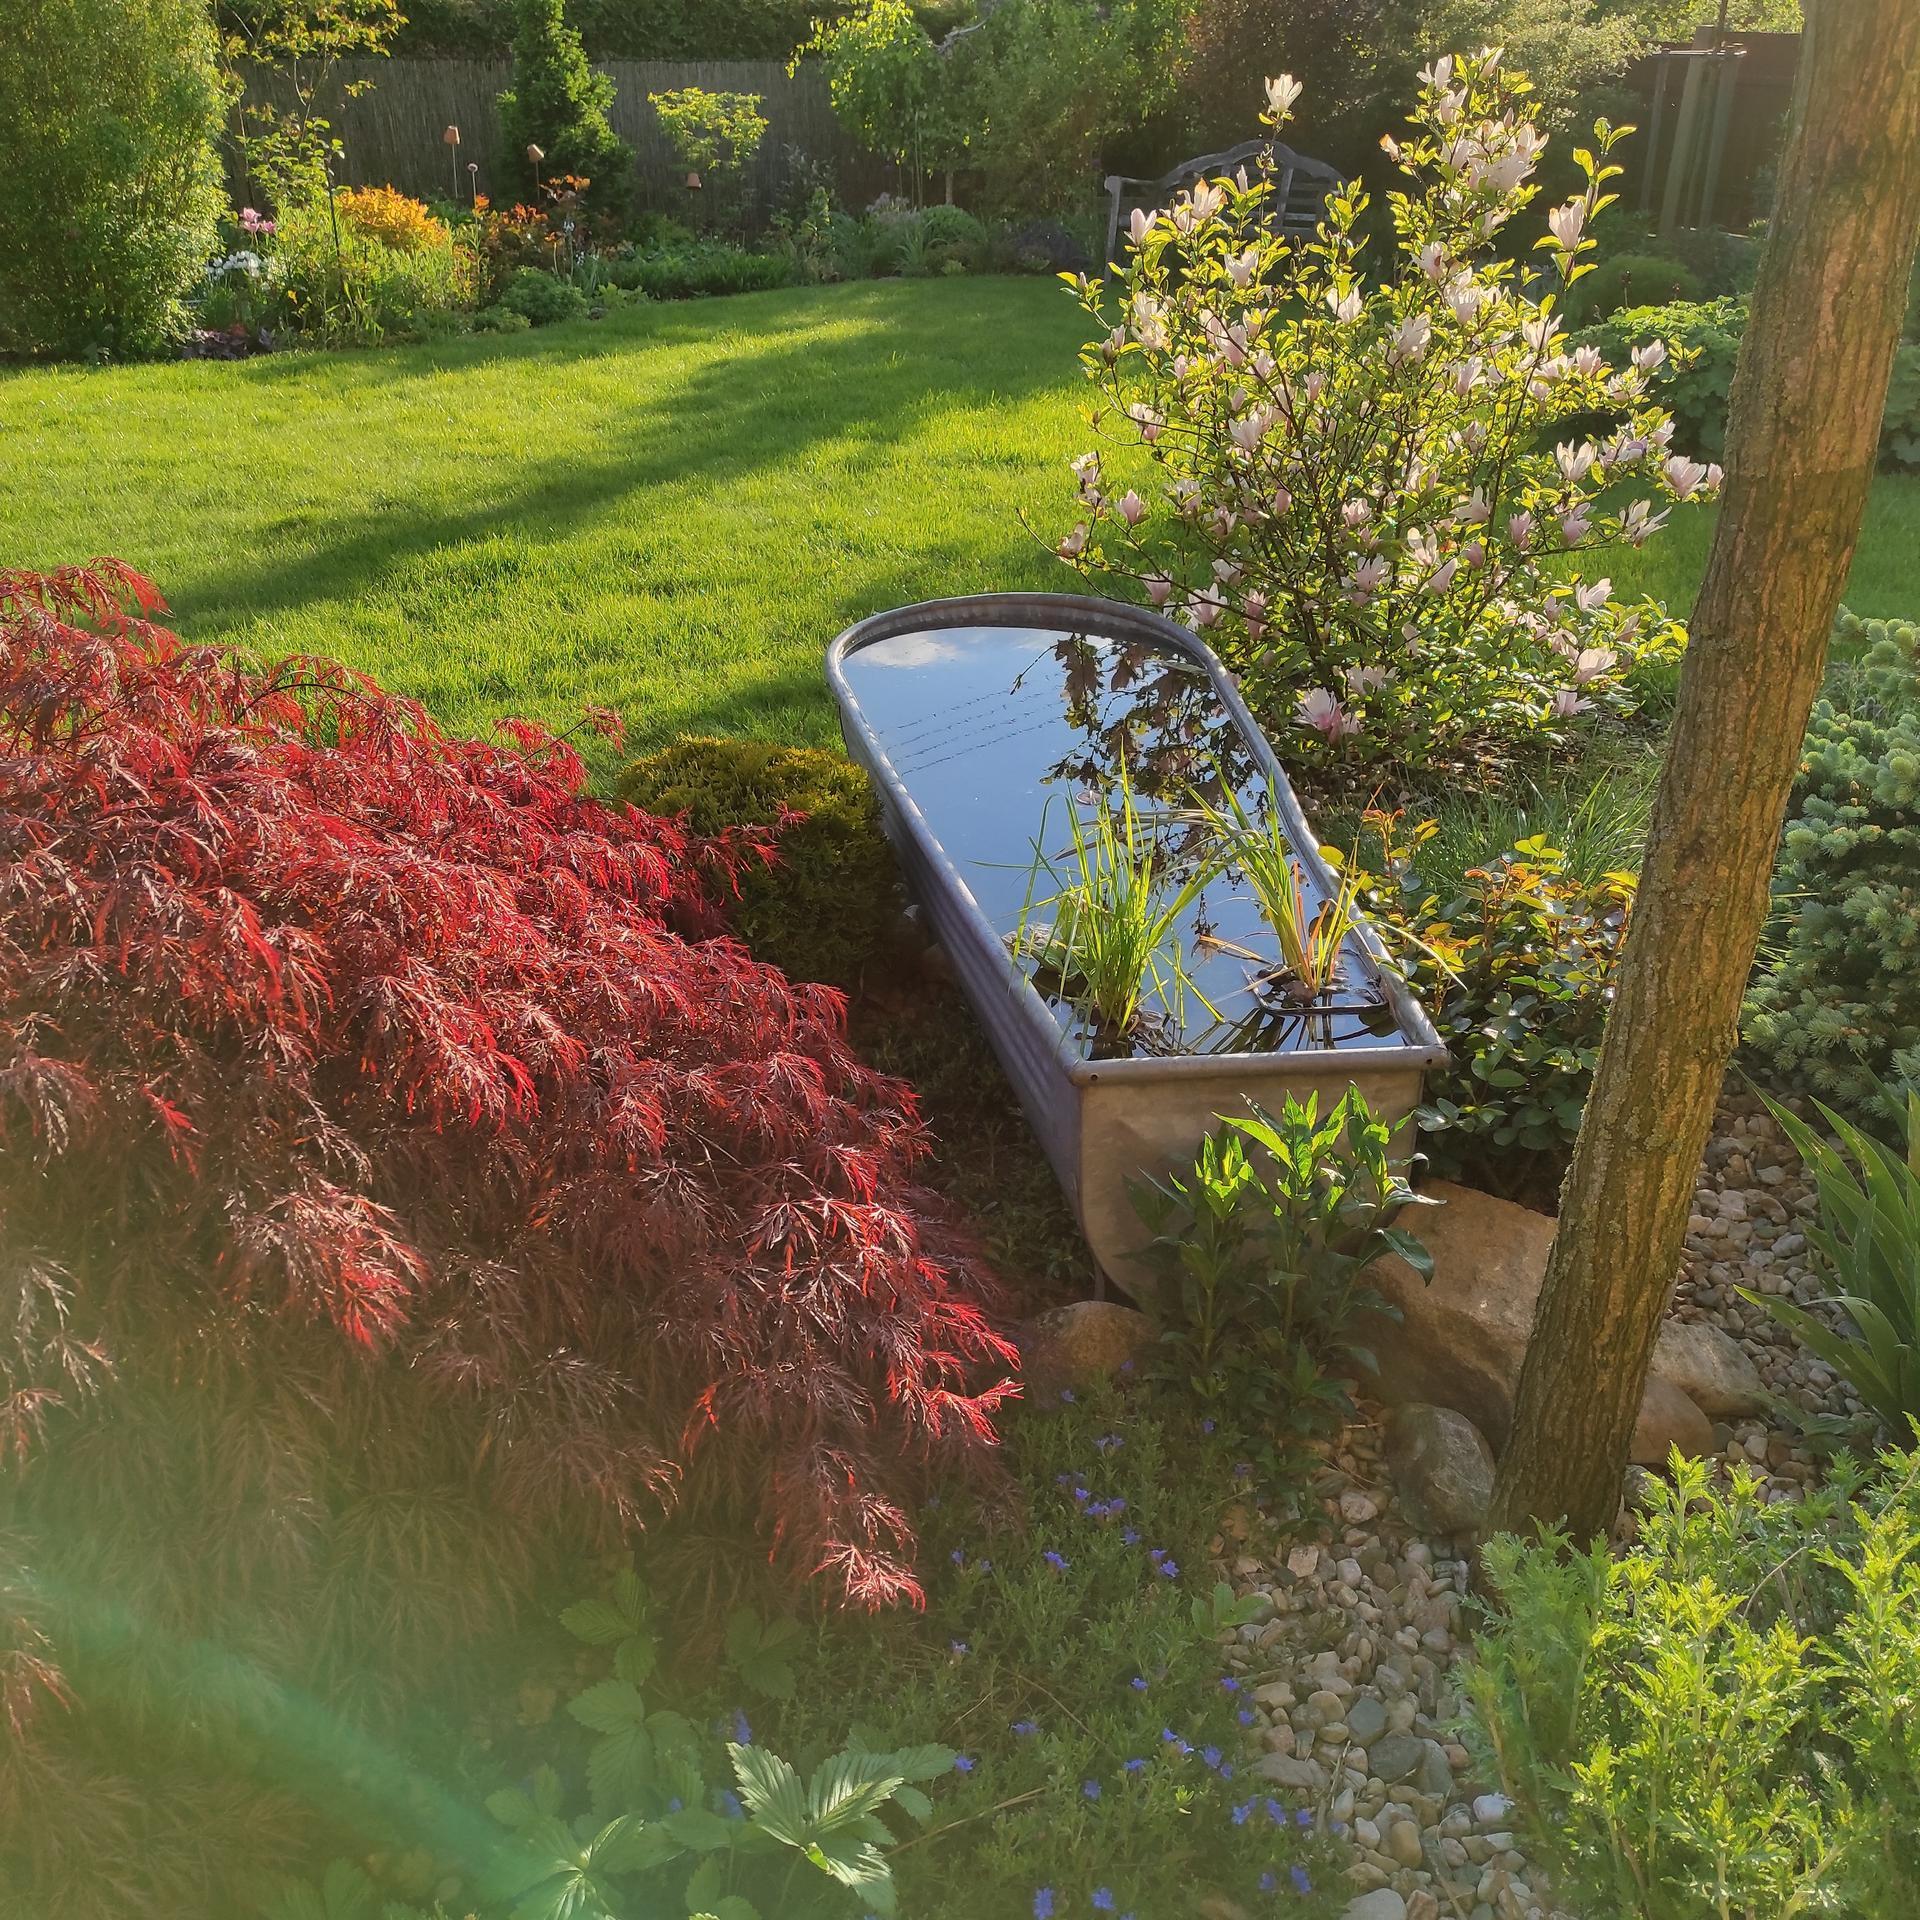 Zahrada 2021 - Obrázek č. 34